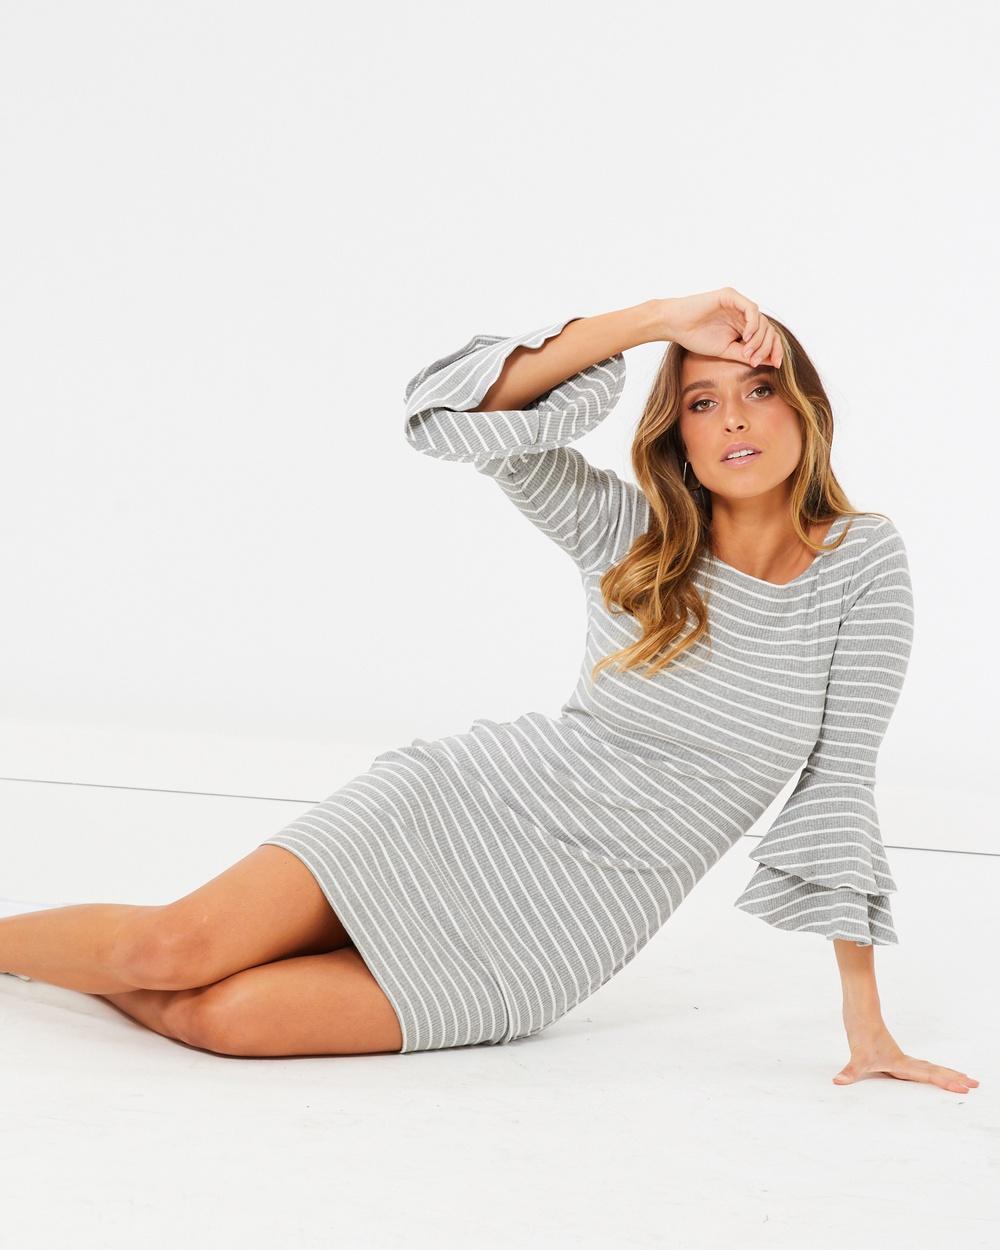 Calli Ange Layered Knit Dress Bodycon Dresses Grey and White Stripe Ange Layered Knit Dress